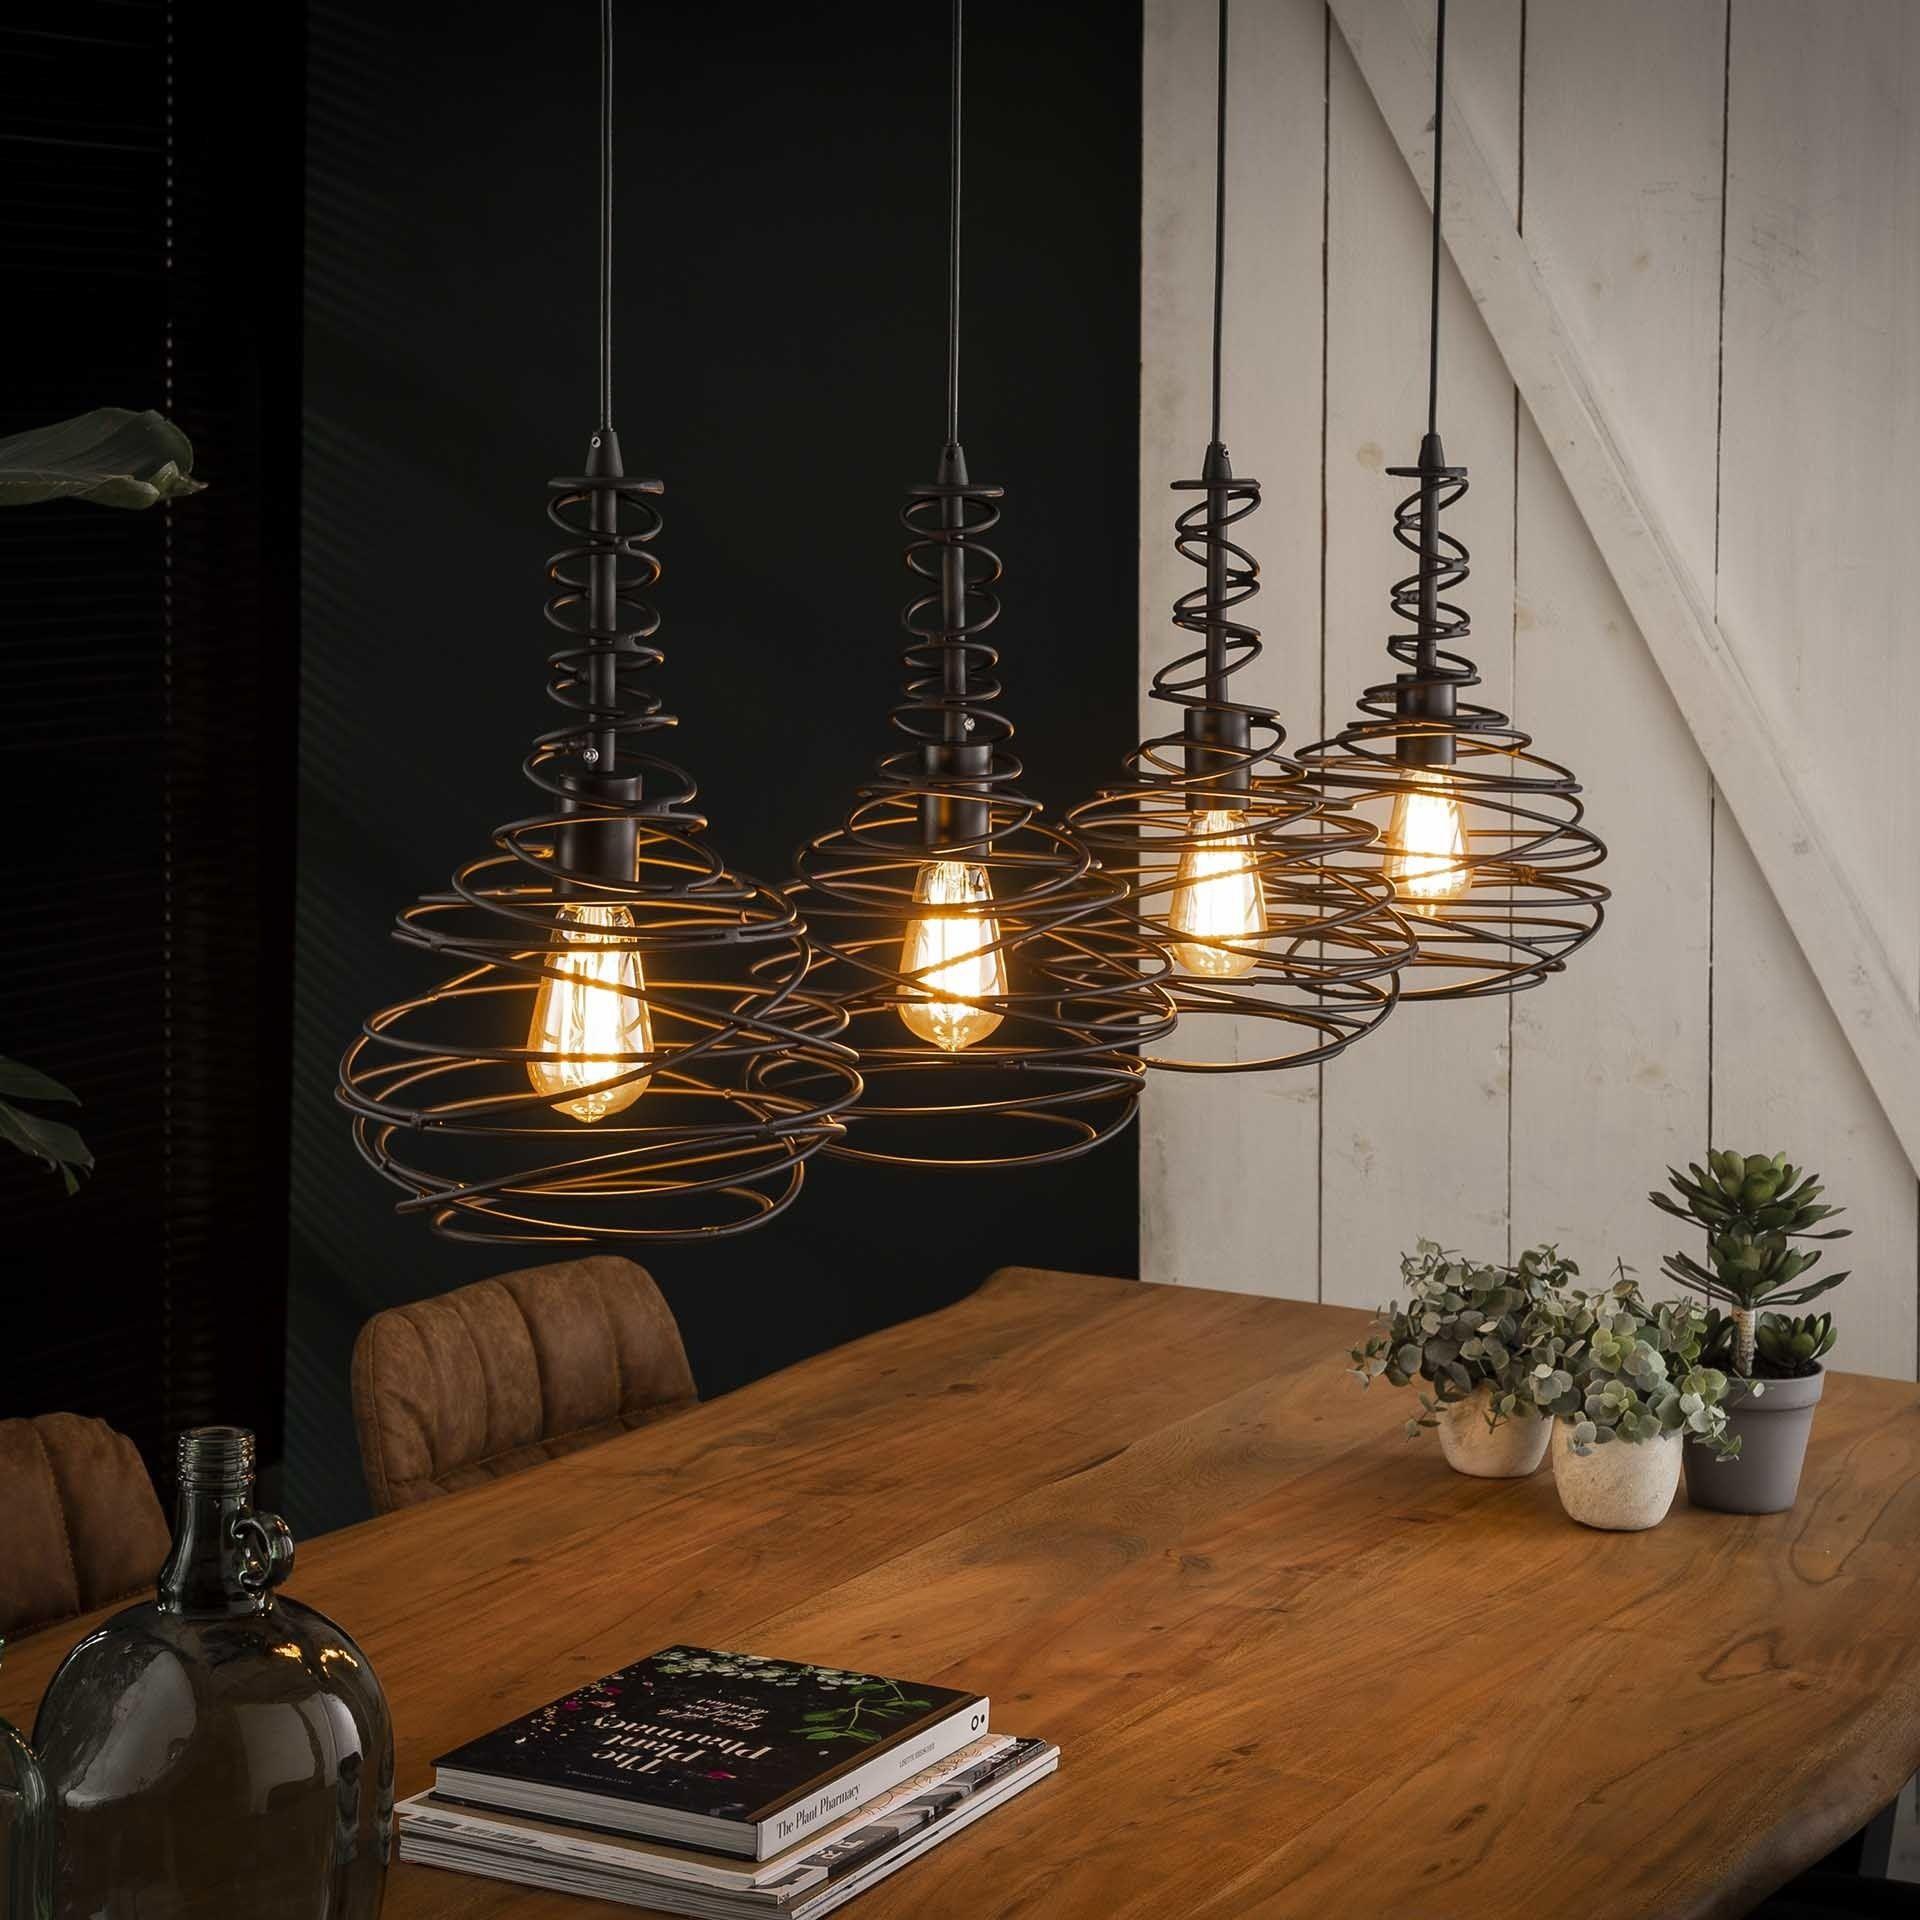 Hängelampe Cone 4 Flammig Metall Schwarz In 2020 Lampe